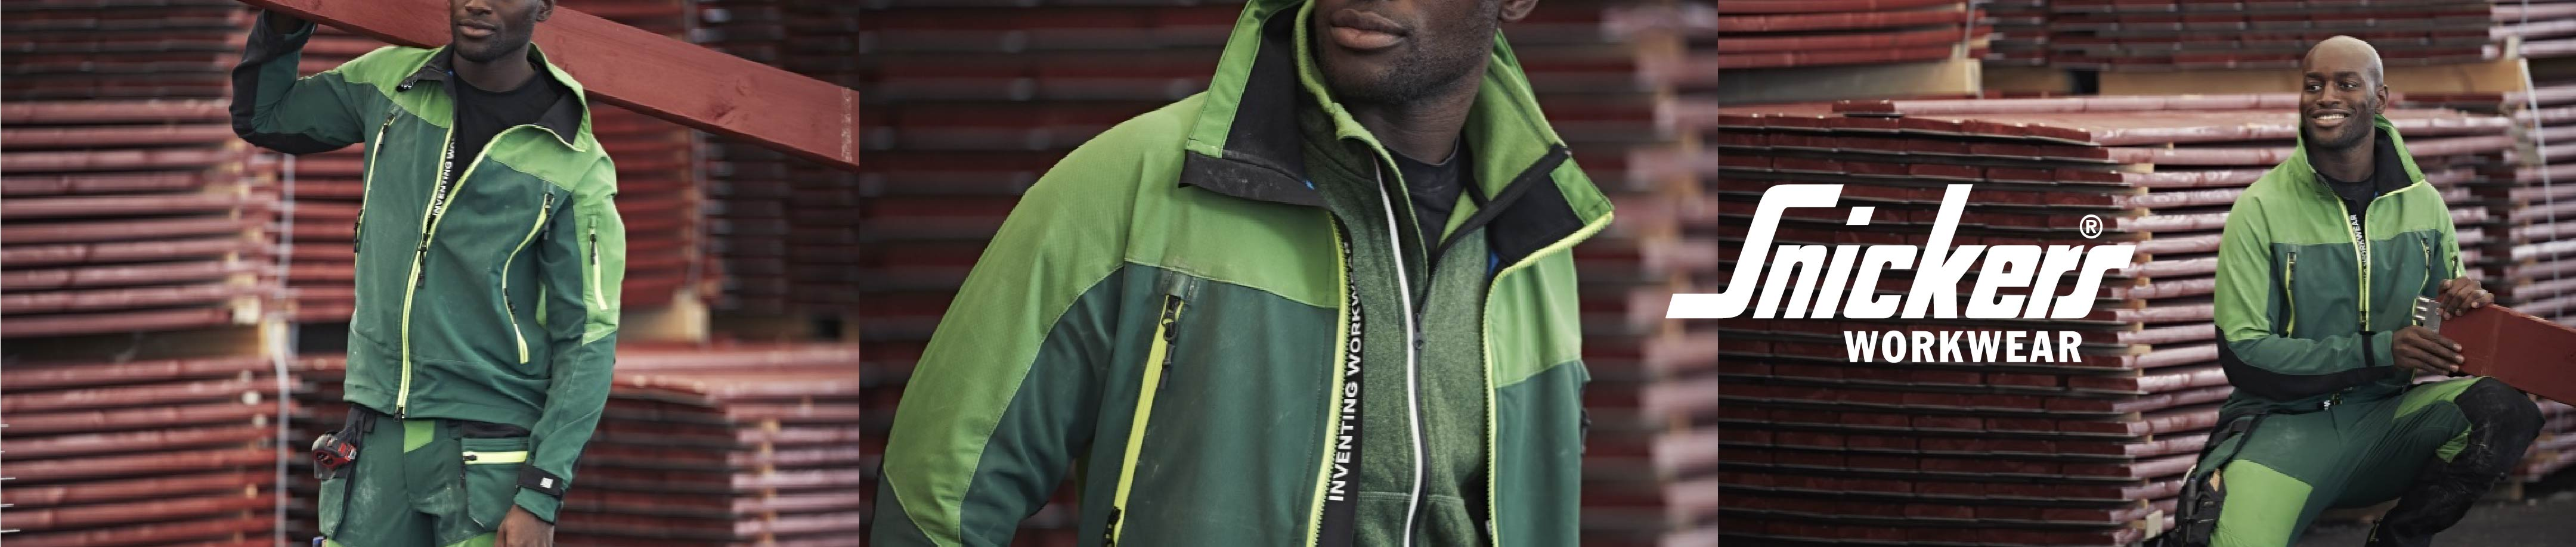 Softshell jackets